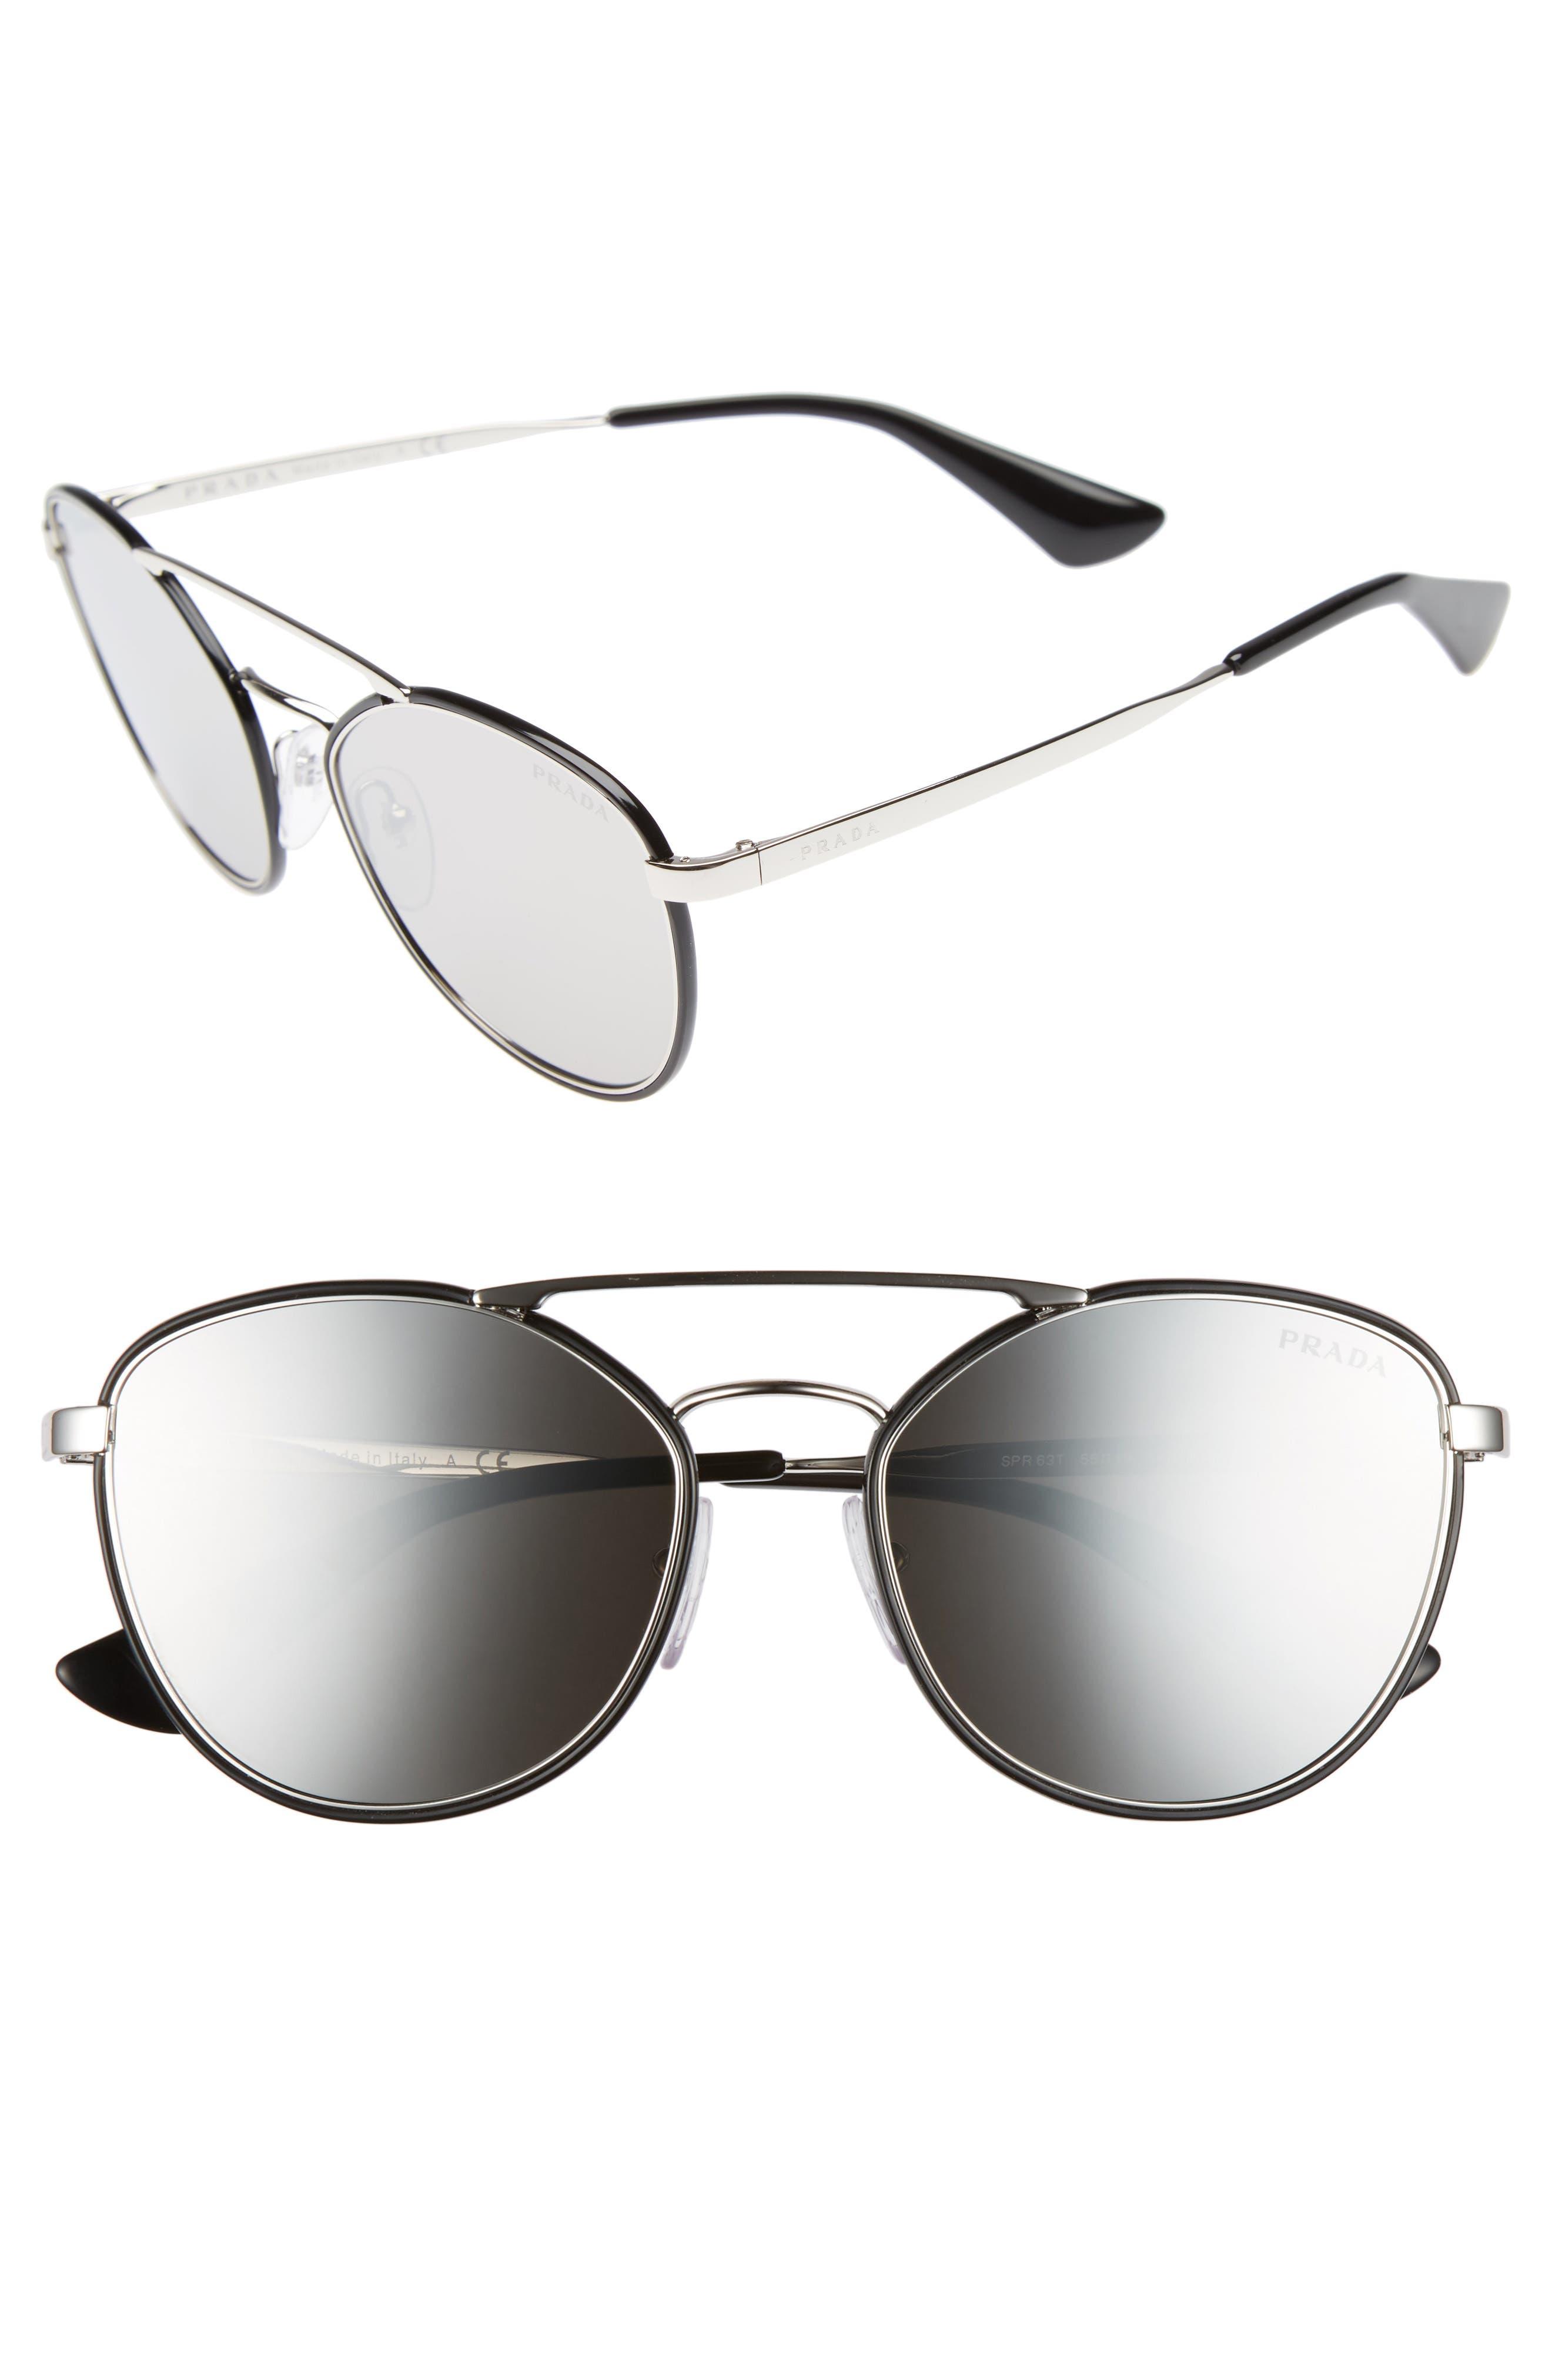 55mm Mirrored Aviator Sunglasses,                         Main,                         color, 001